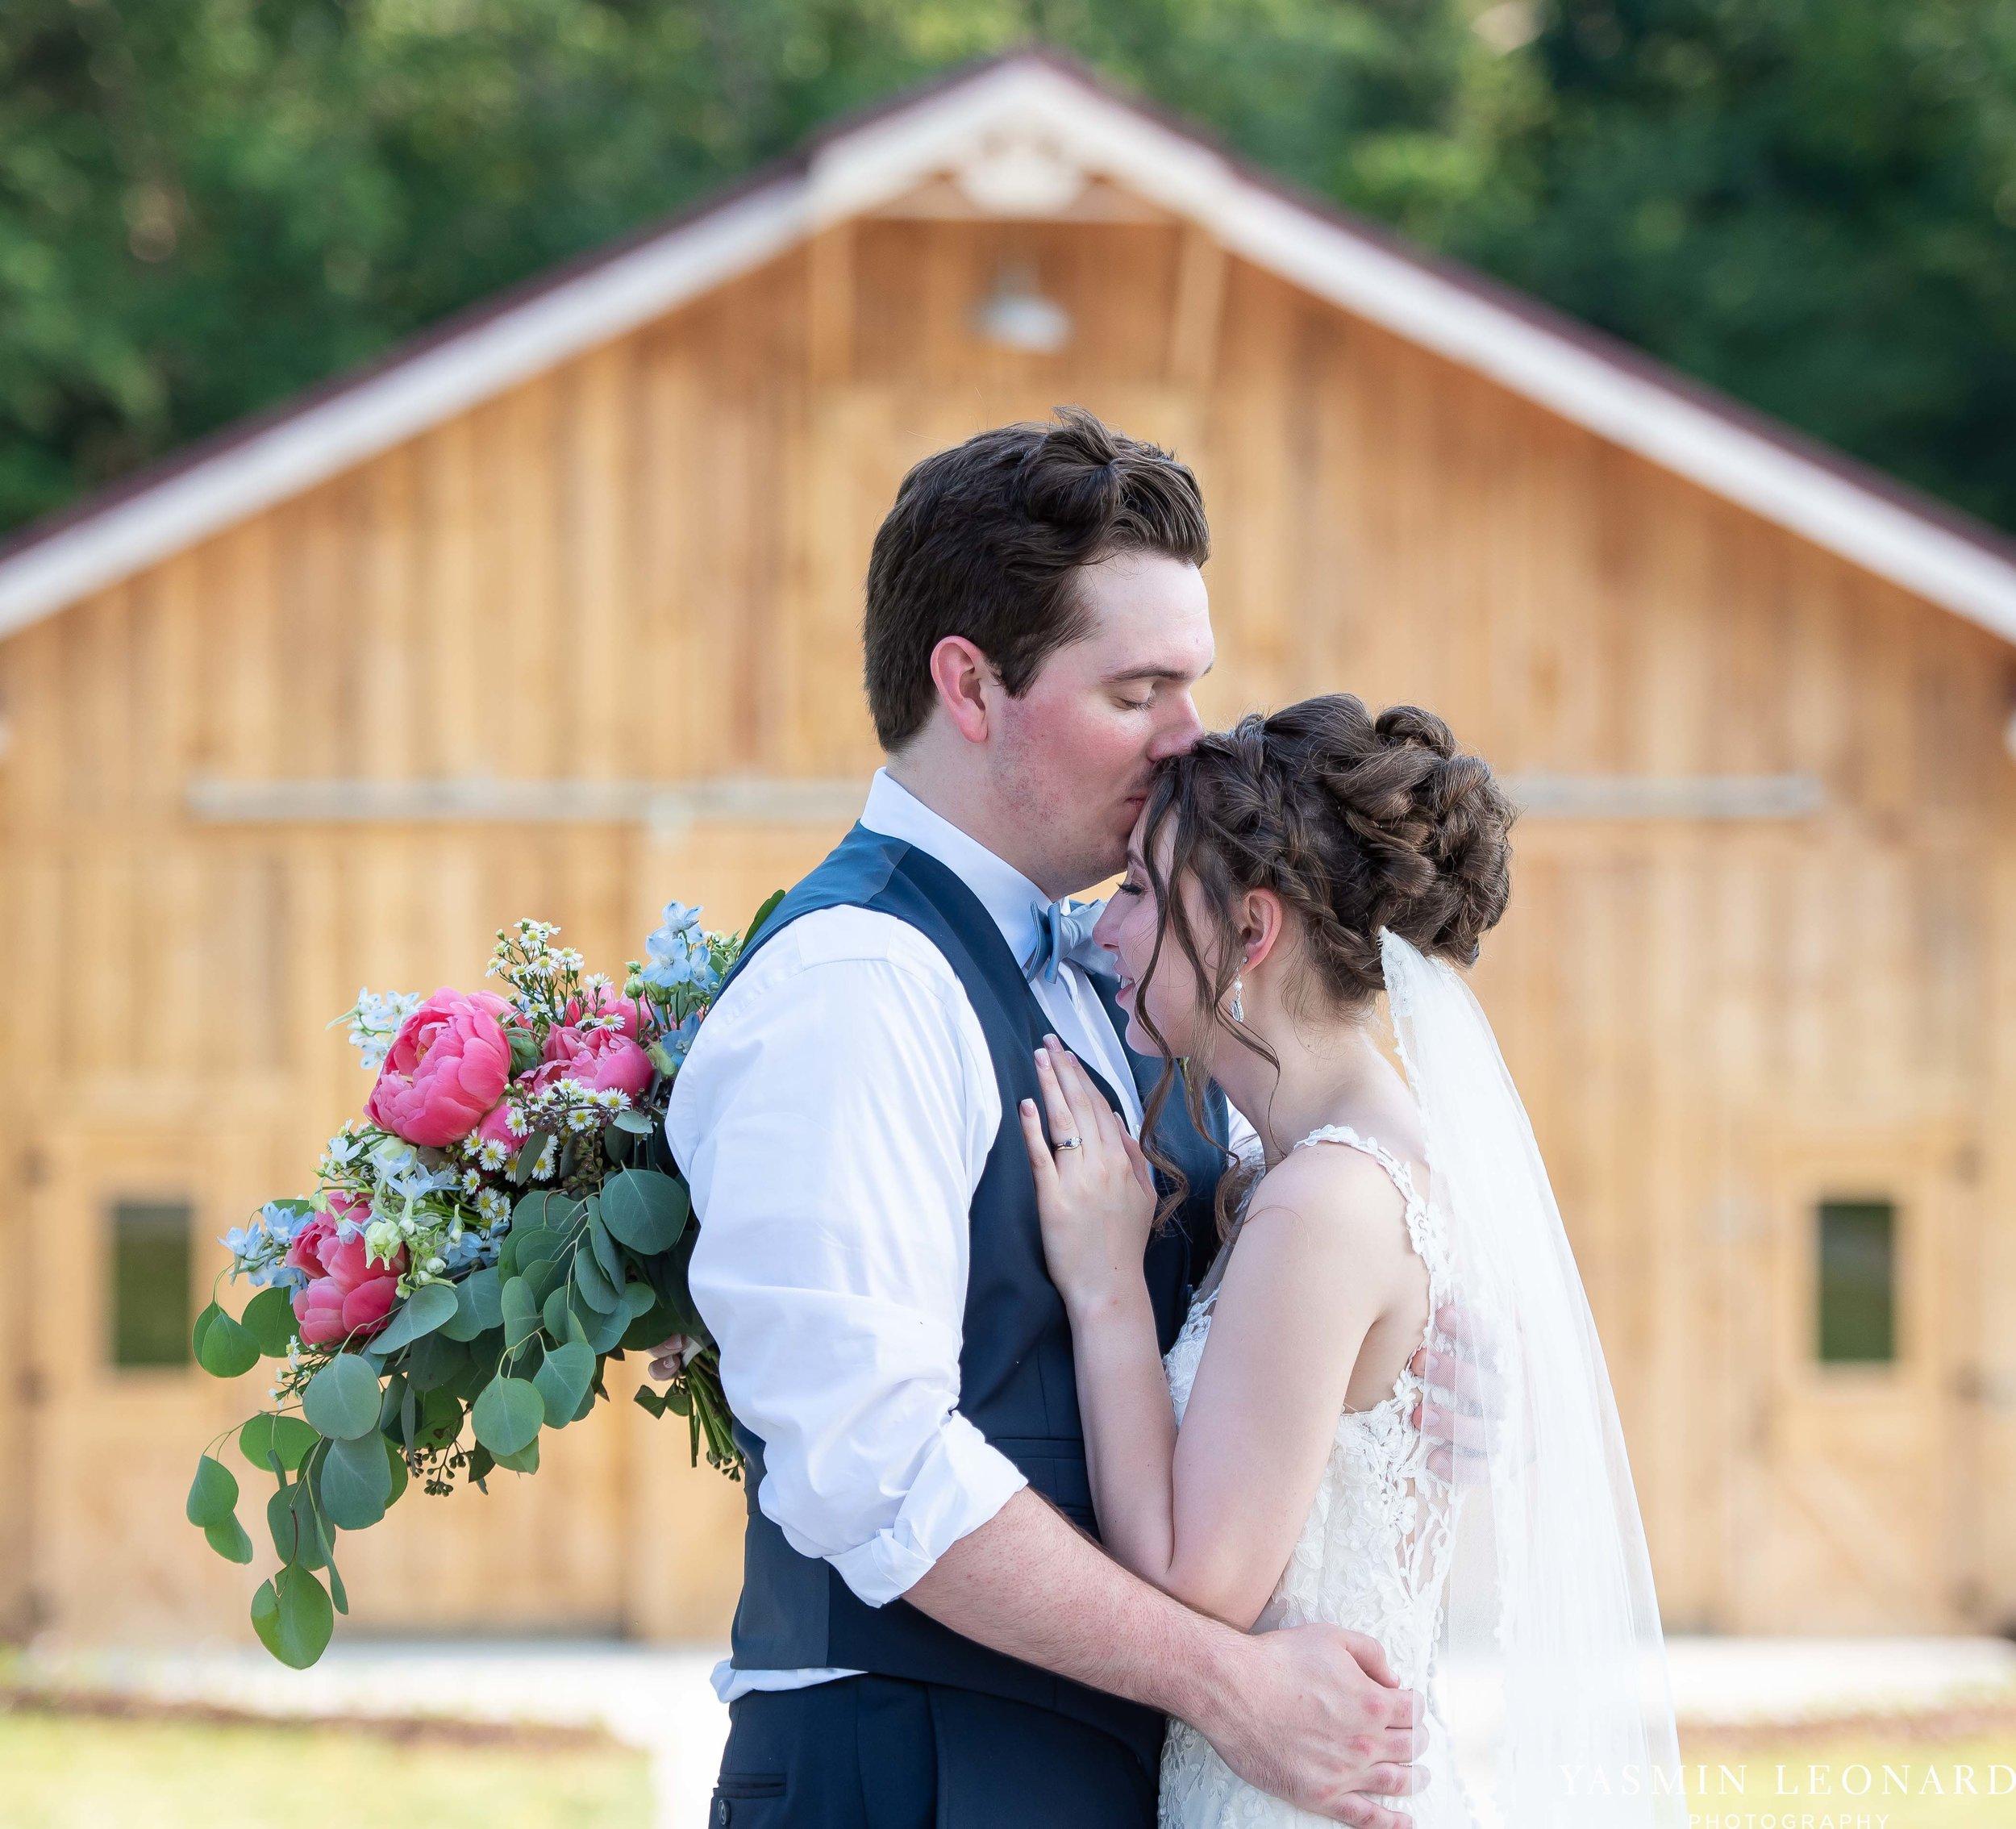 Old Homeplace Vineyard - NC Weddings - Outdoor Summer Weddings - Peony Boutique - Vineyard Wedding - NC Photographer - Yasmin Leonard Photography-37.jpg